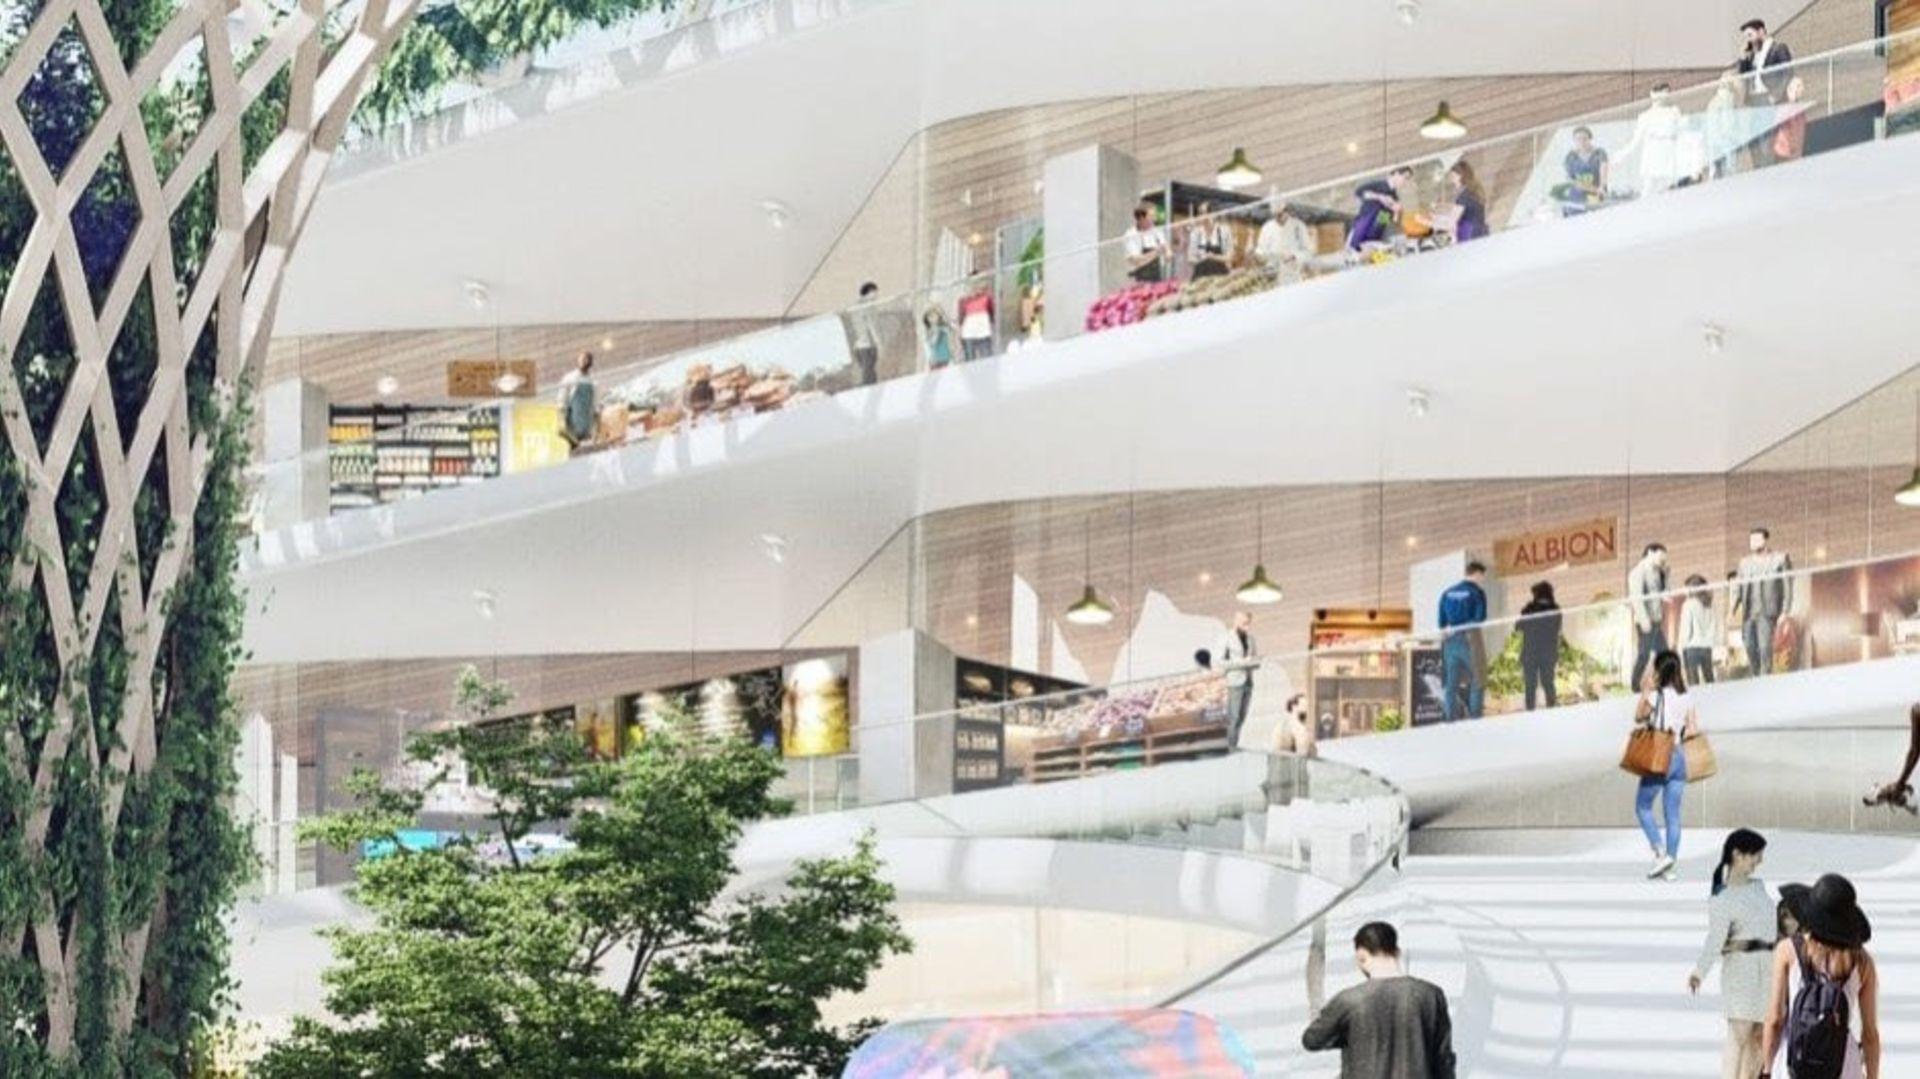 Westfield Unveils High-Tech Future with AI Walkways & Sensory Gardens